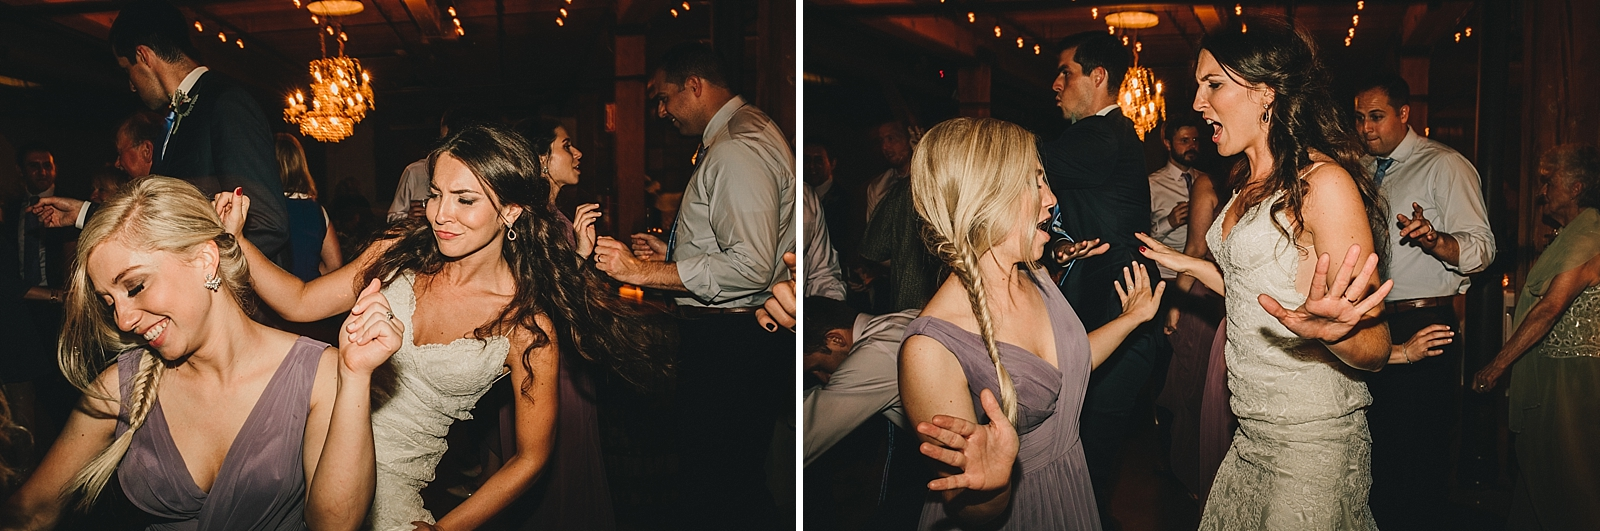 Brielle&Rob-TanaHelenePhotography-652_WEB.jpg